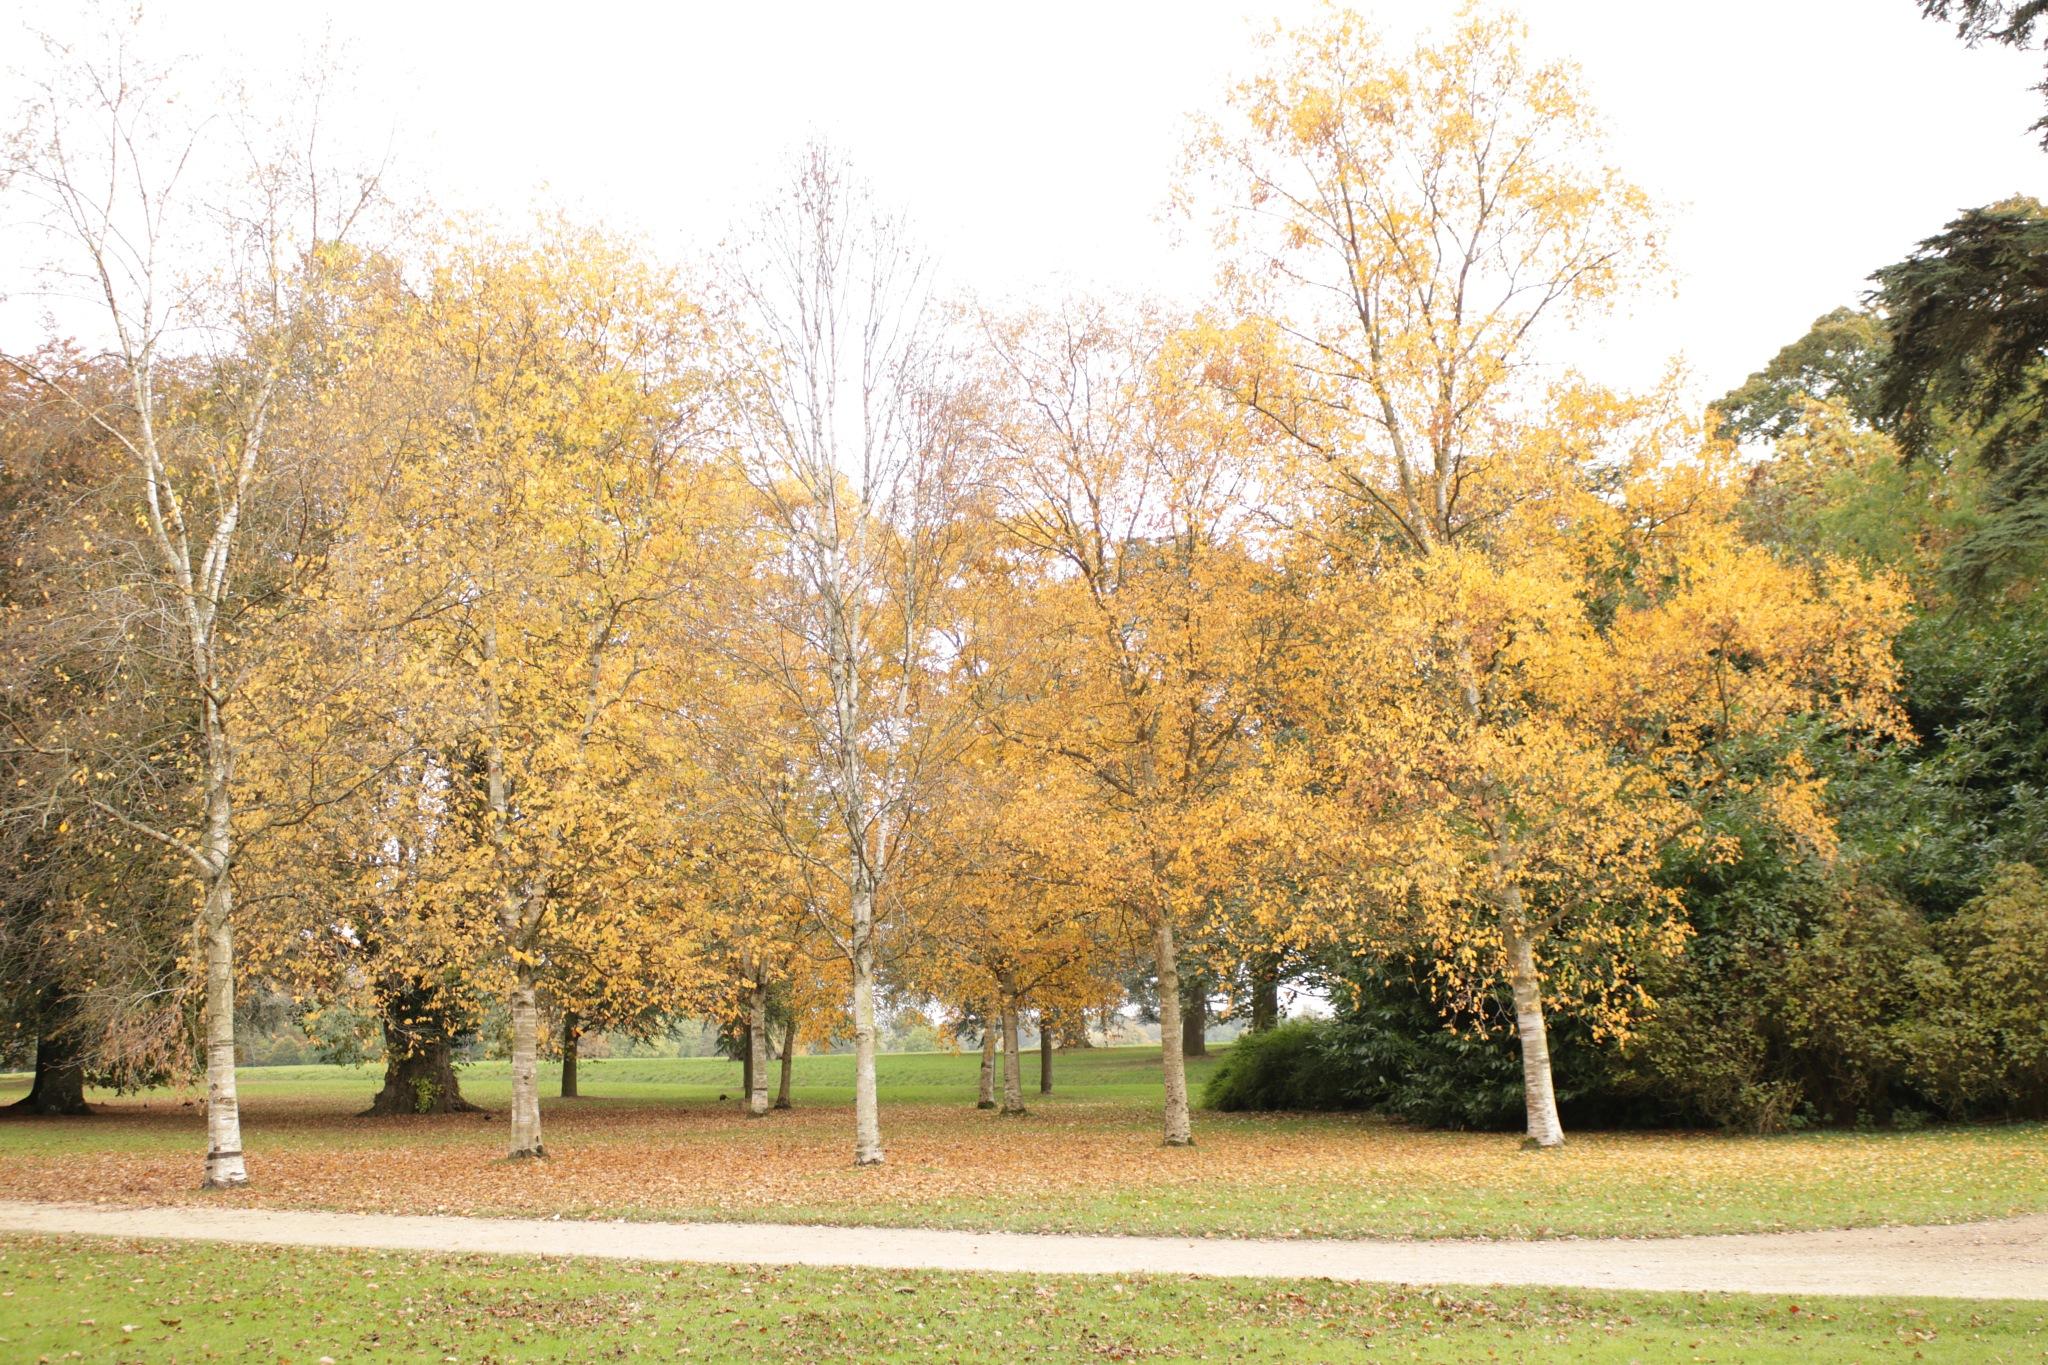 Autumn at Blenhiem Palace by Mo Dessouki